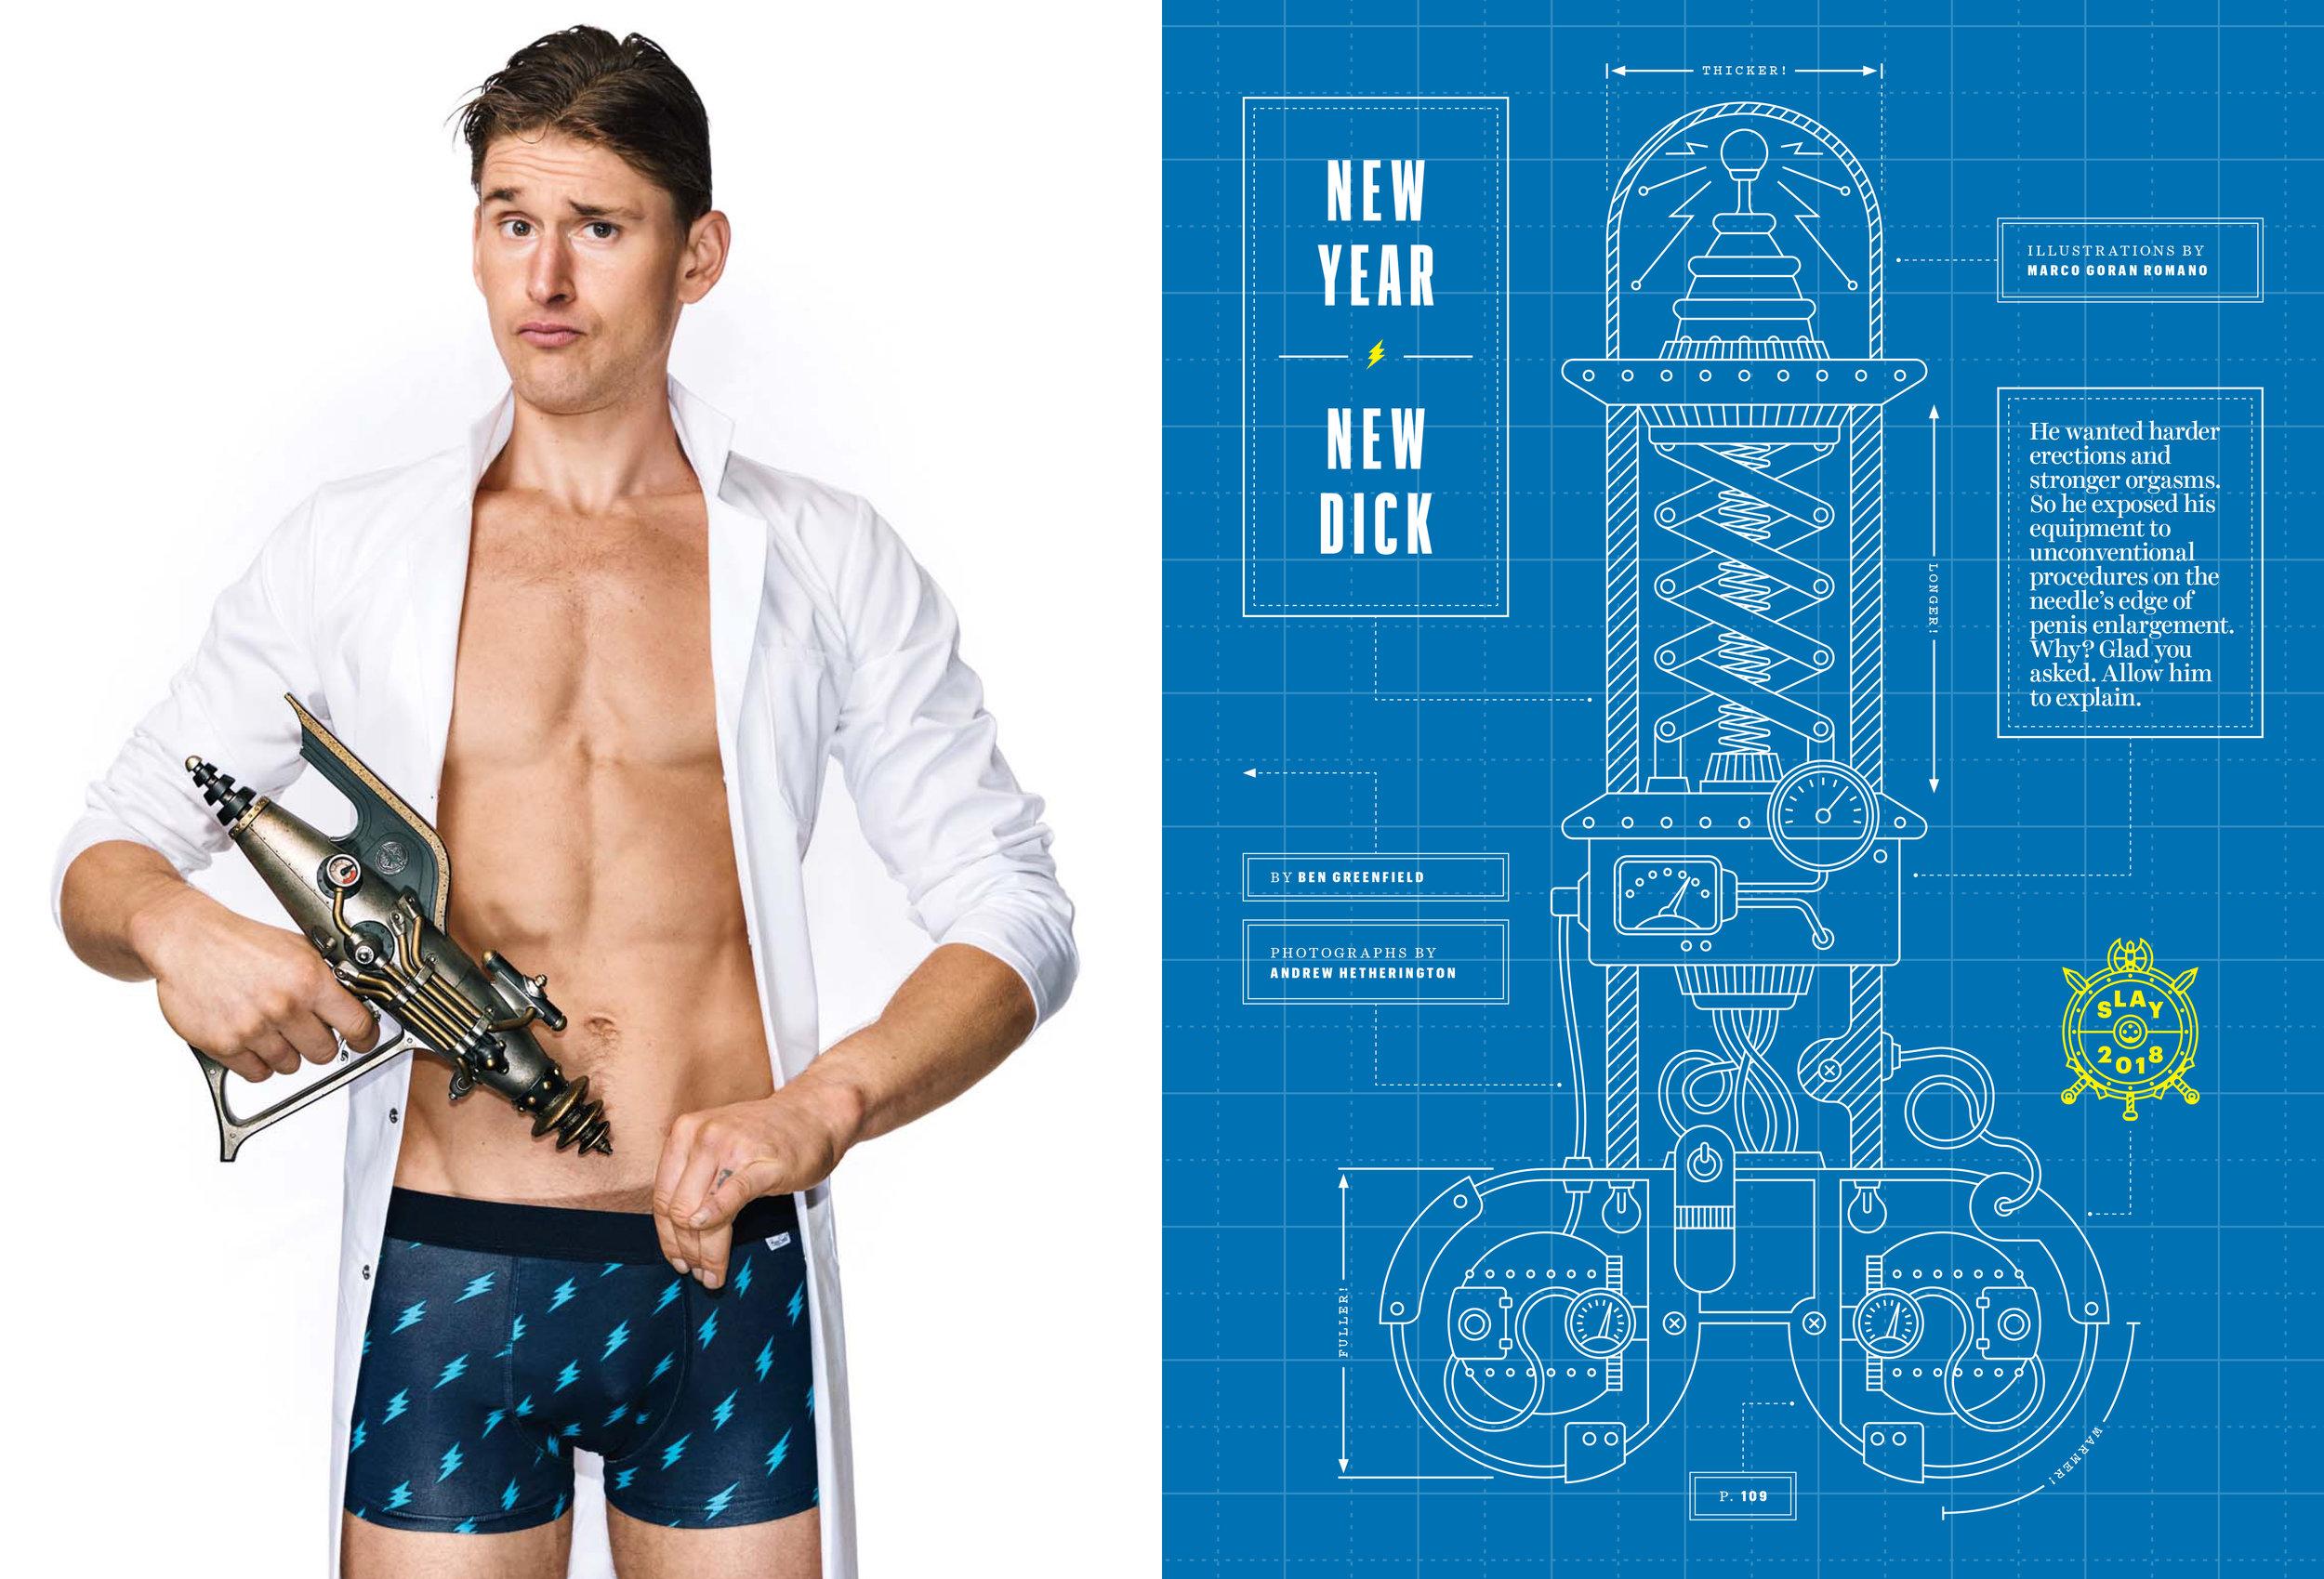 New Year, New Dick - Men's Health - January:February 2018.jpg